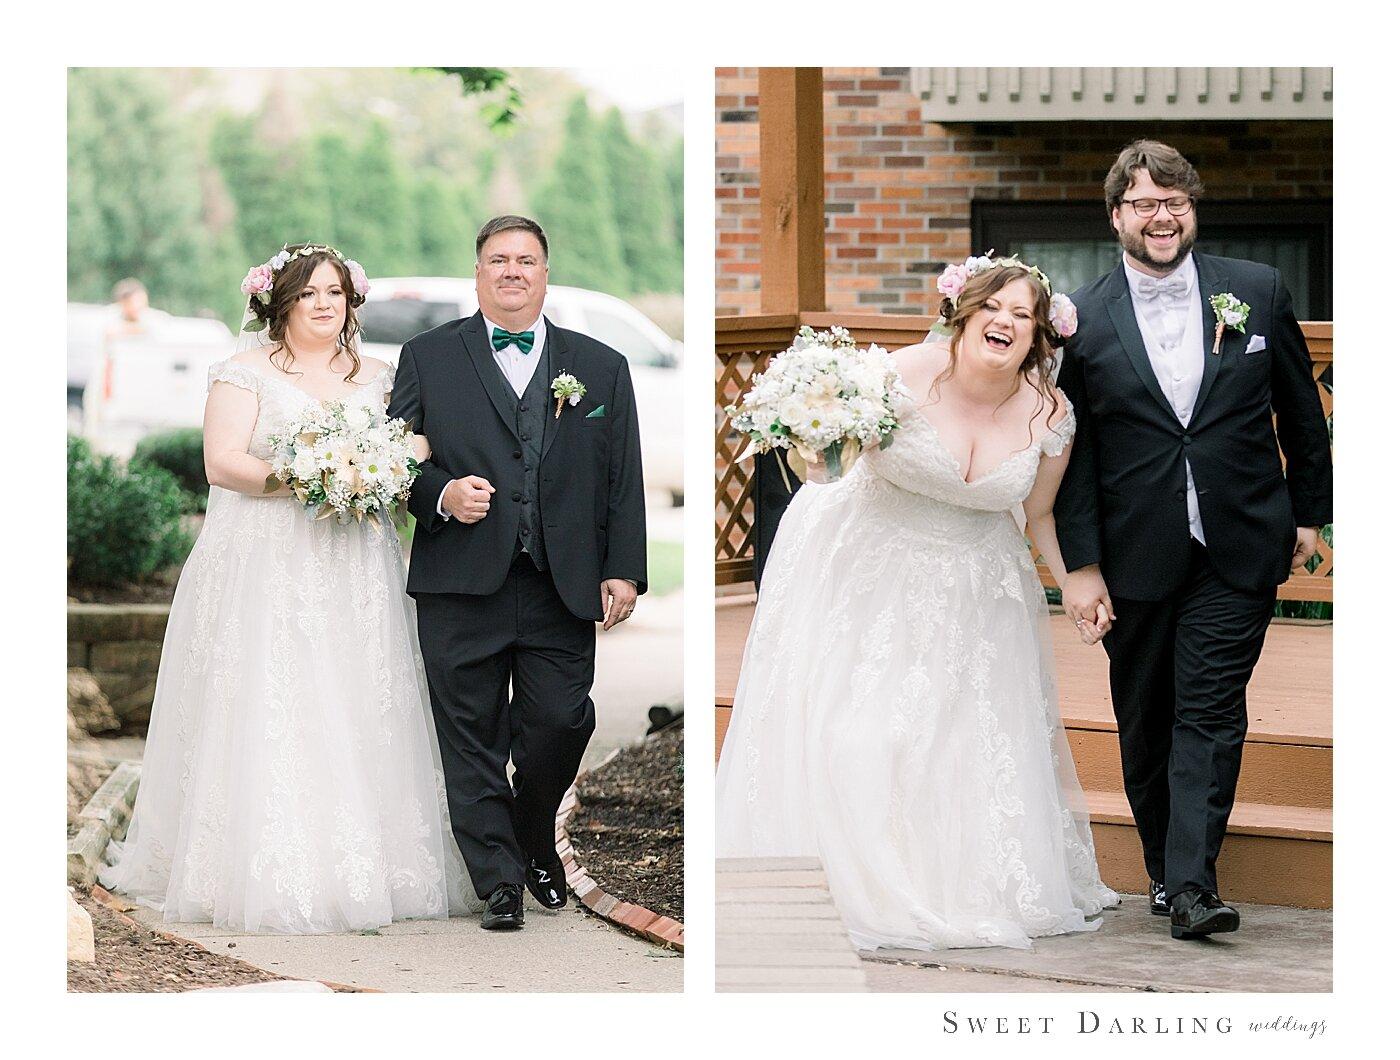 Bloomington-Normal-IL-Wedding-Photographer-eastland-suites-hotel_0023.jpg